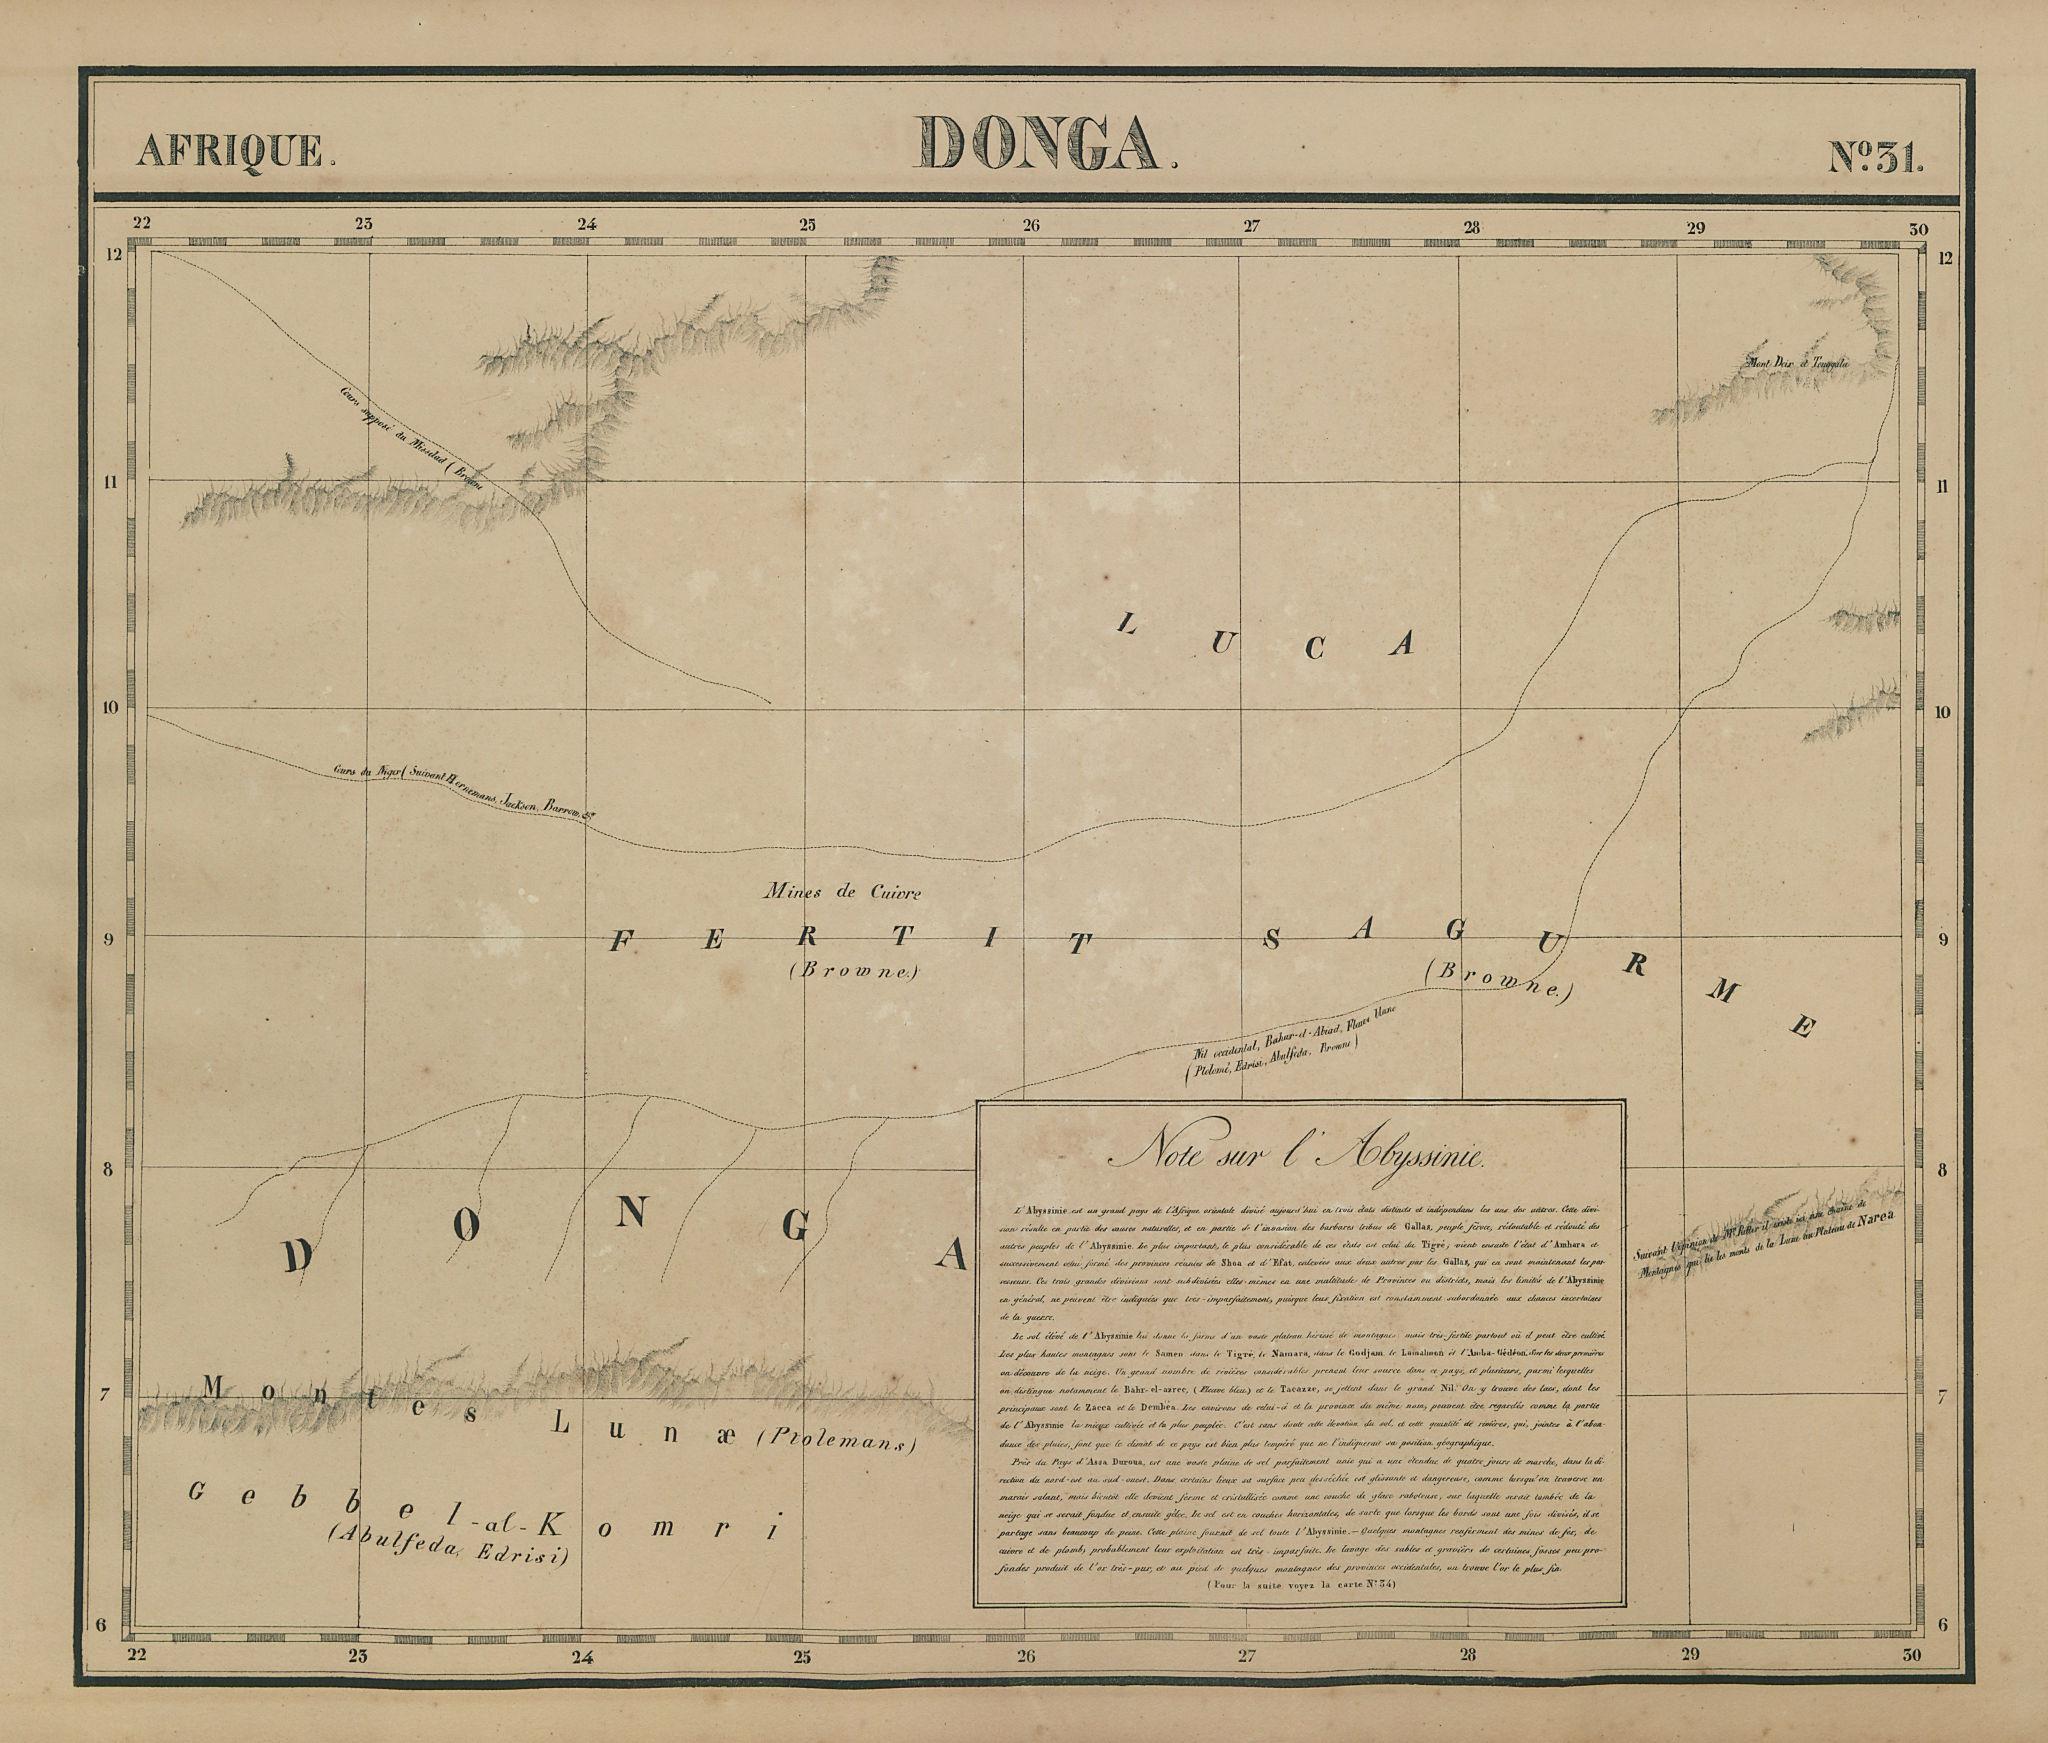 Afrique. Donga #31. South / Southern Sudan. White Nile. VANDERMAELEN 1827 map